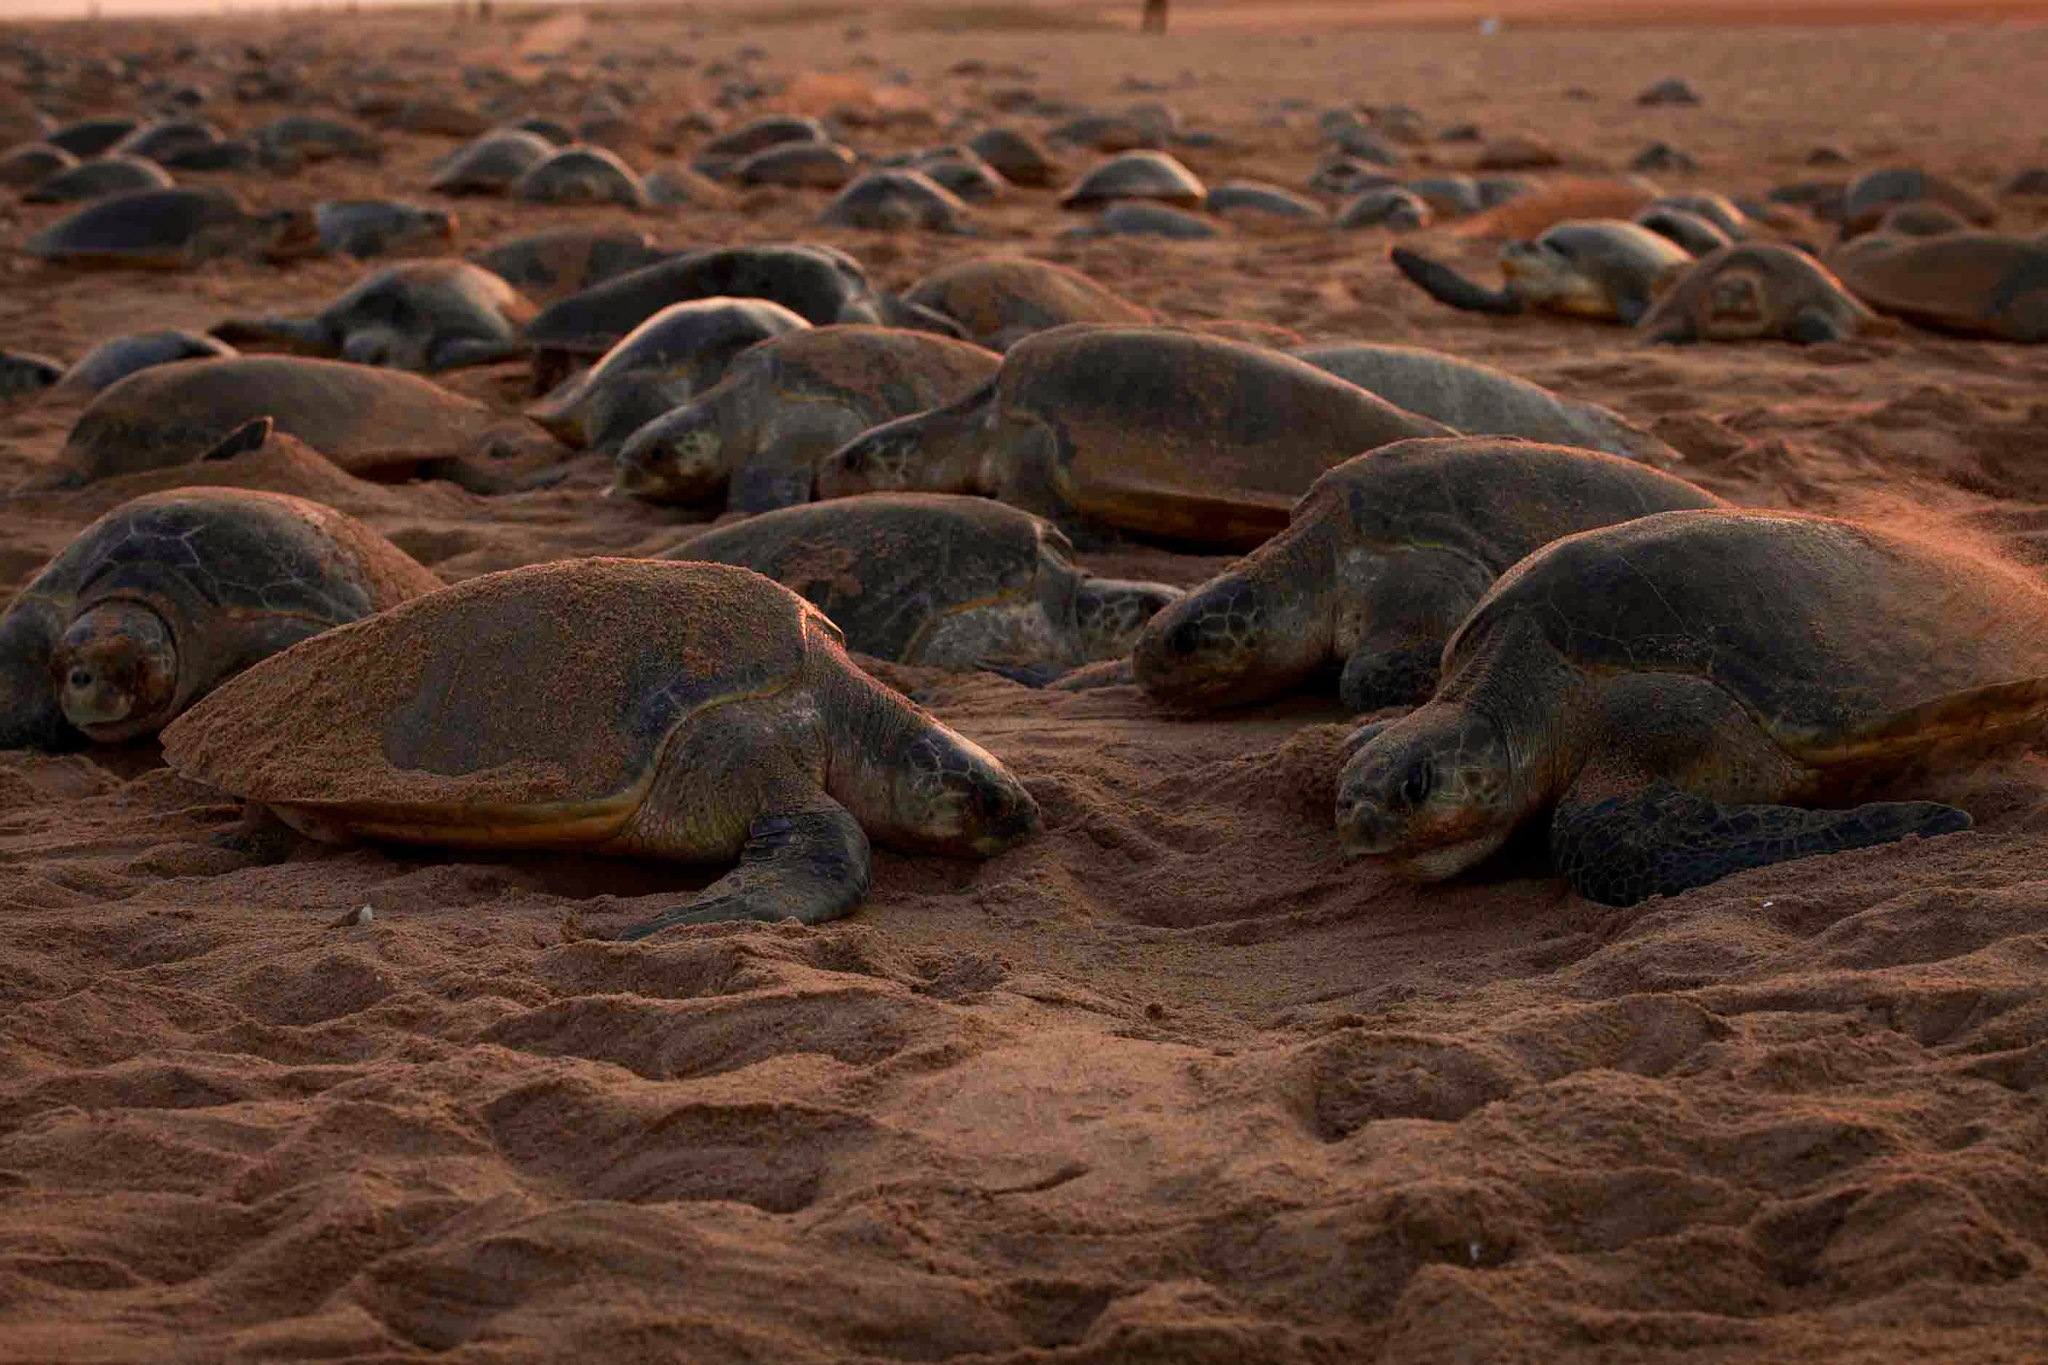 Olive ridley turtles at Rushikulya, Odisha, during the mass nesting phenomenon known as arribada. Photo: Kartik Shanker